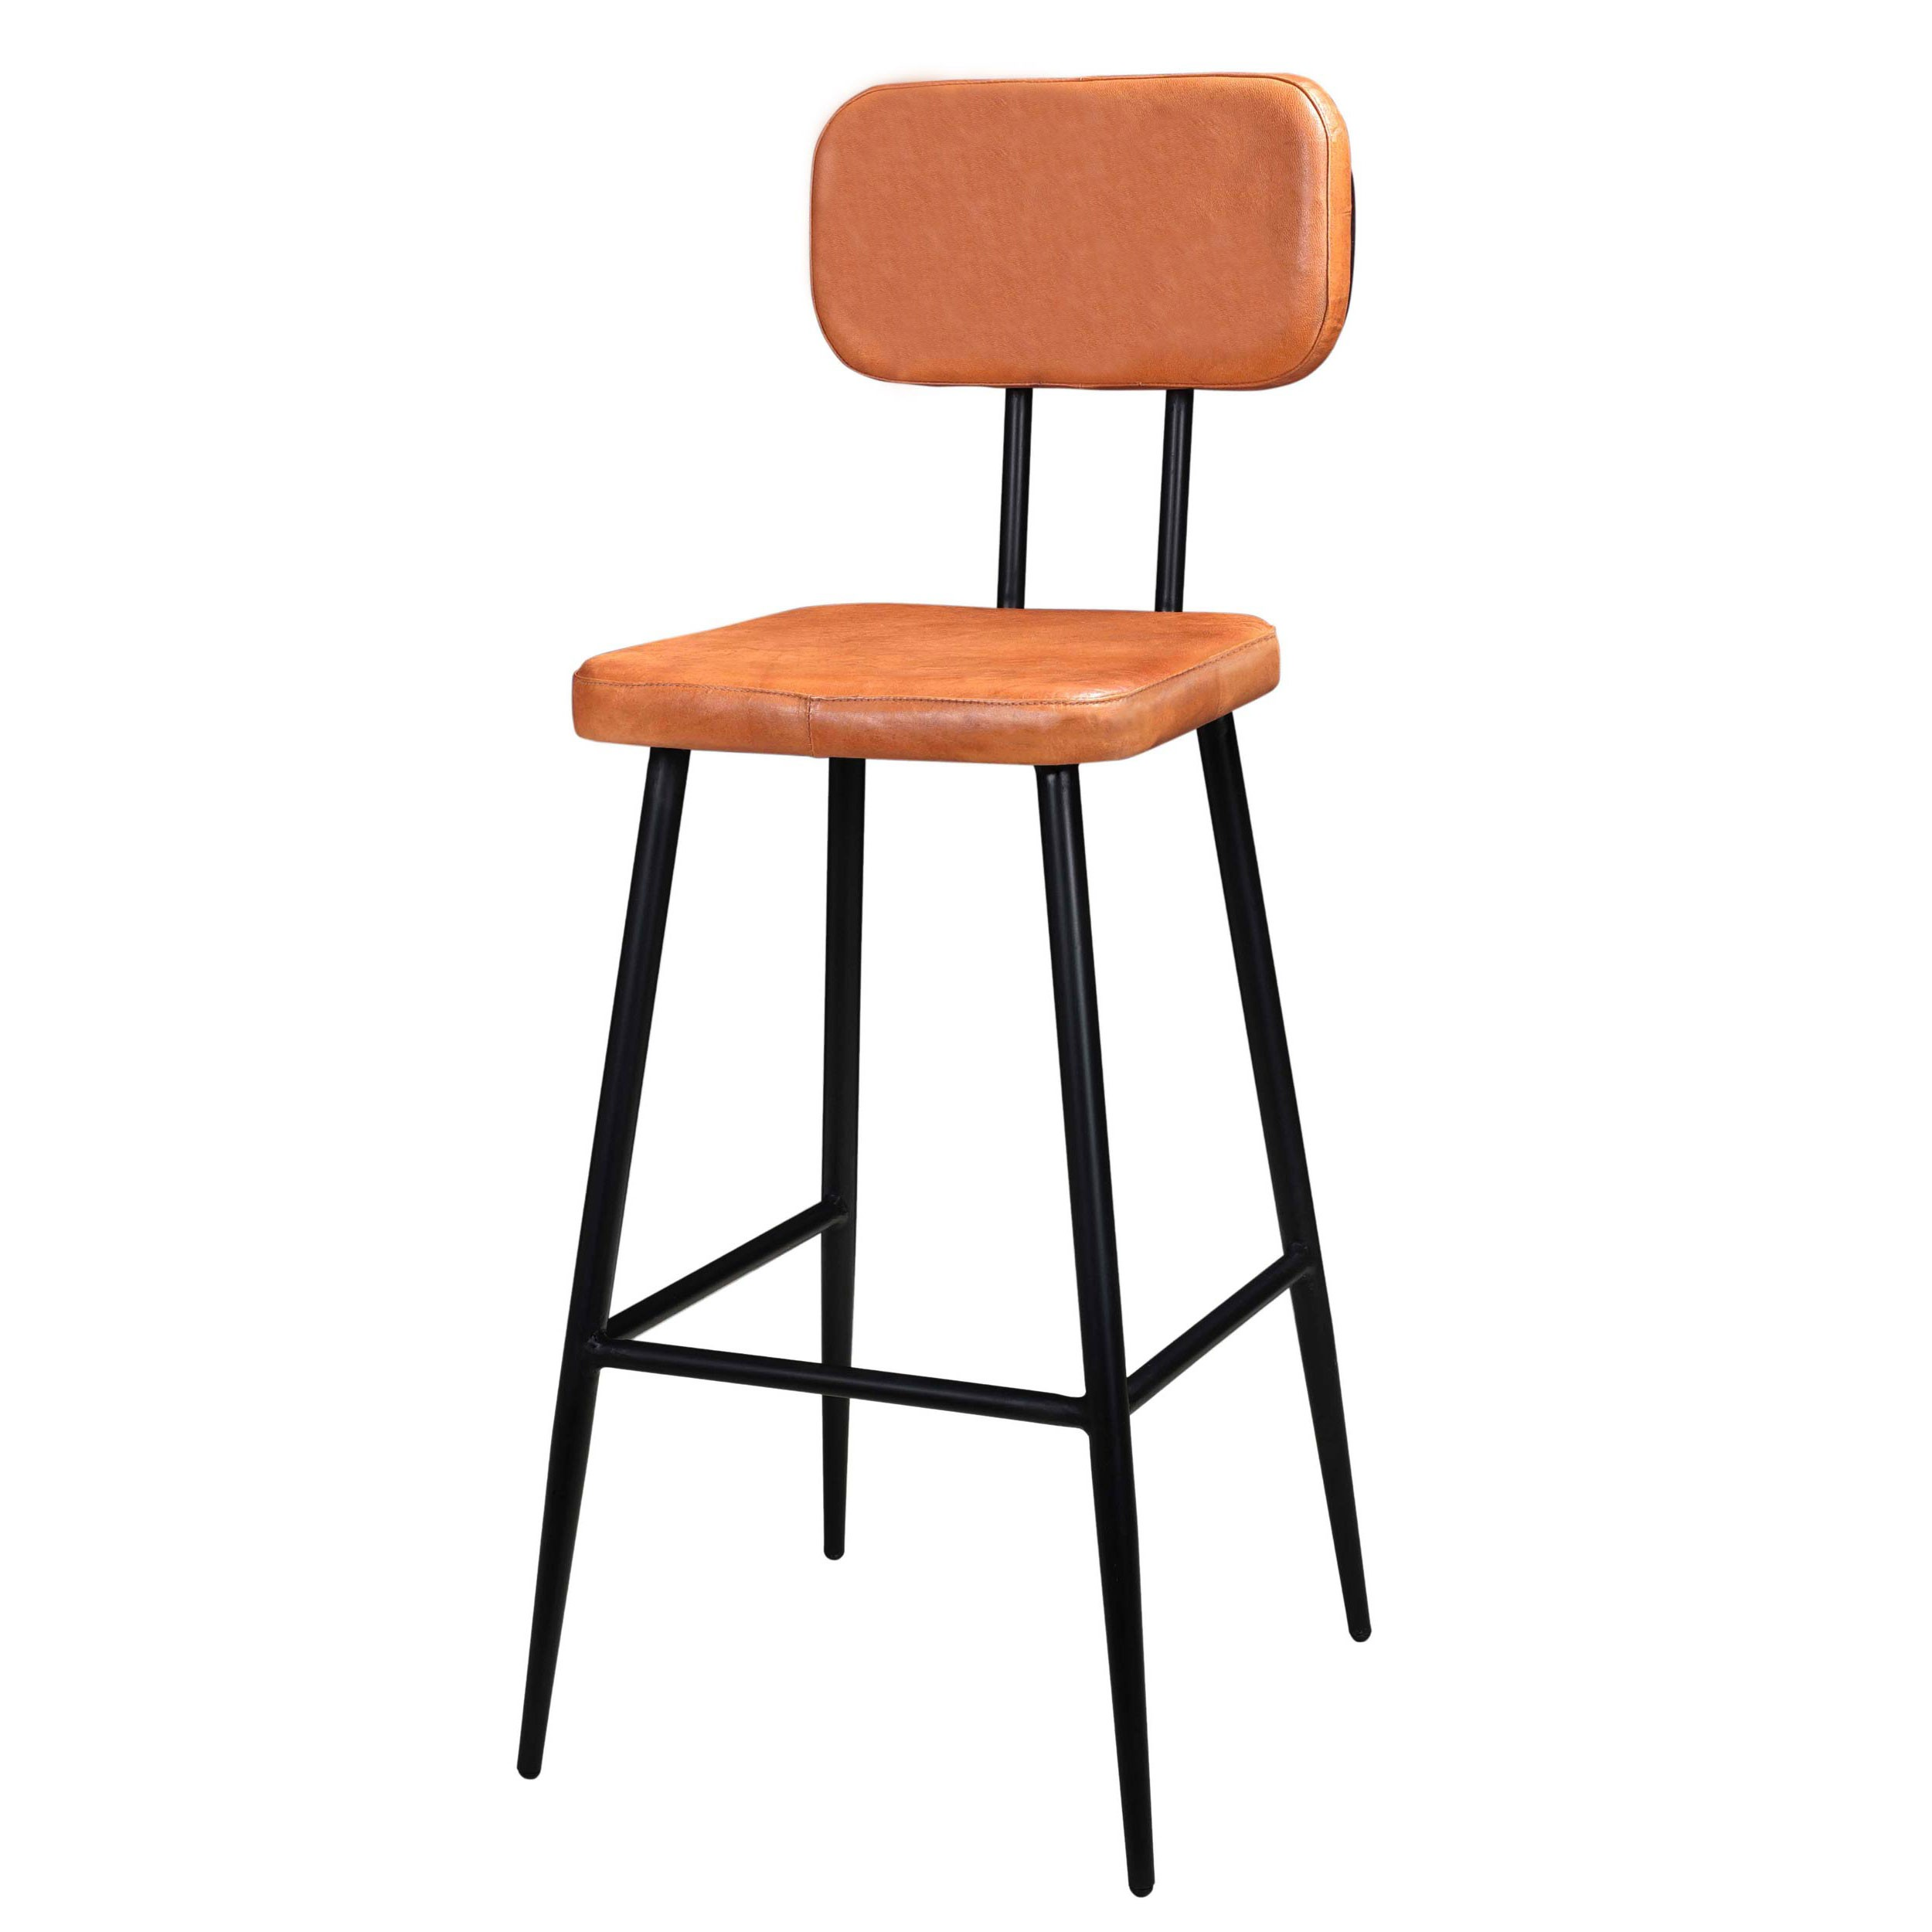 acheter chaise de bar cuir metal